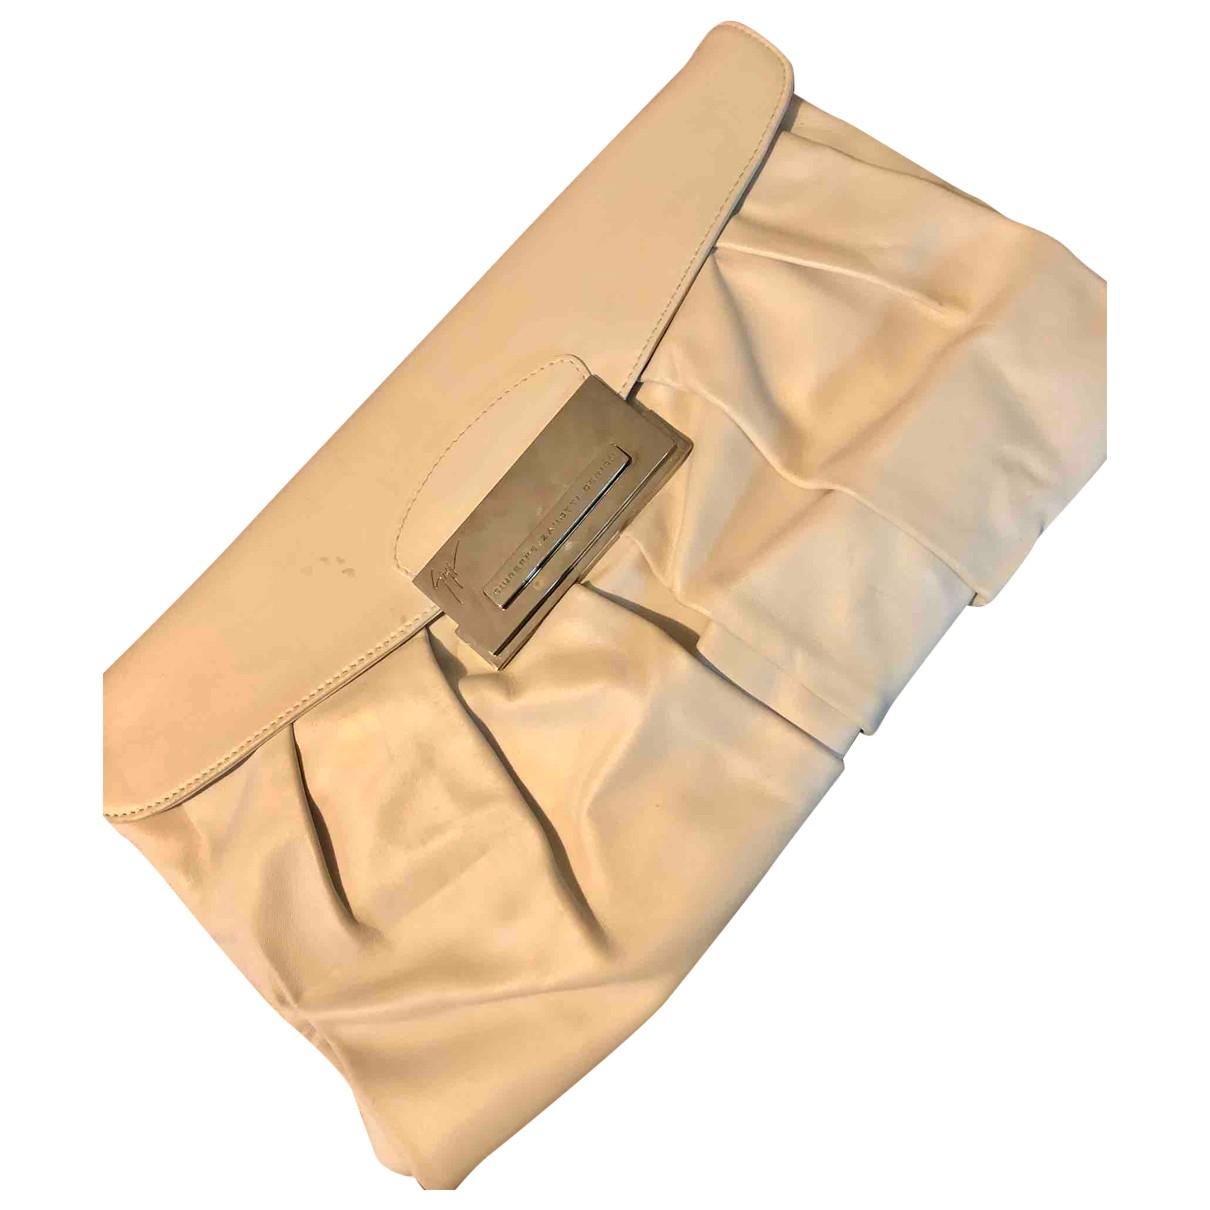 Giuseppe Zanotti \N White Leather Clutch bag for Women \N